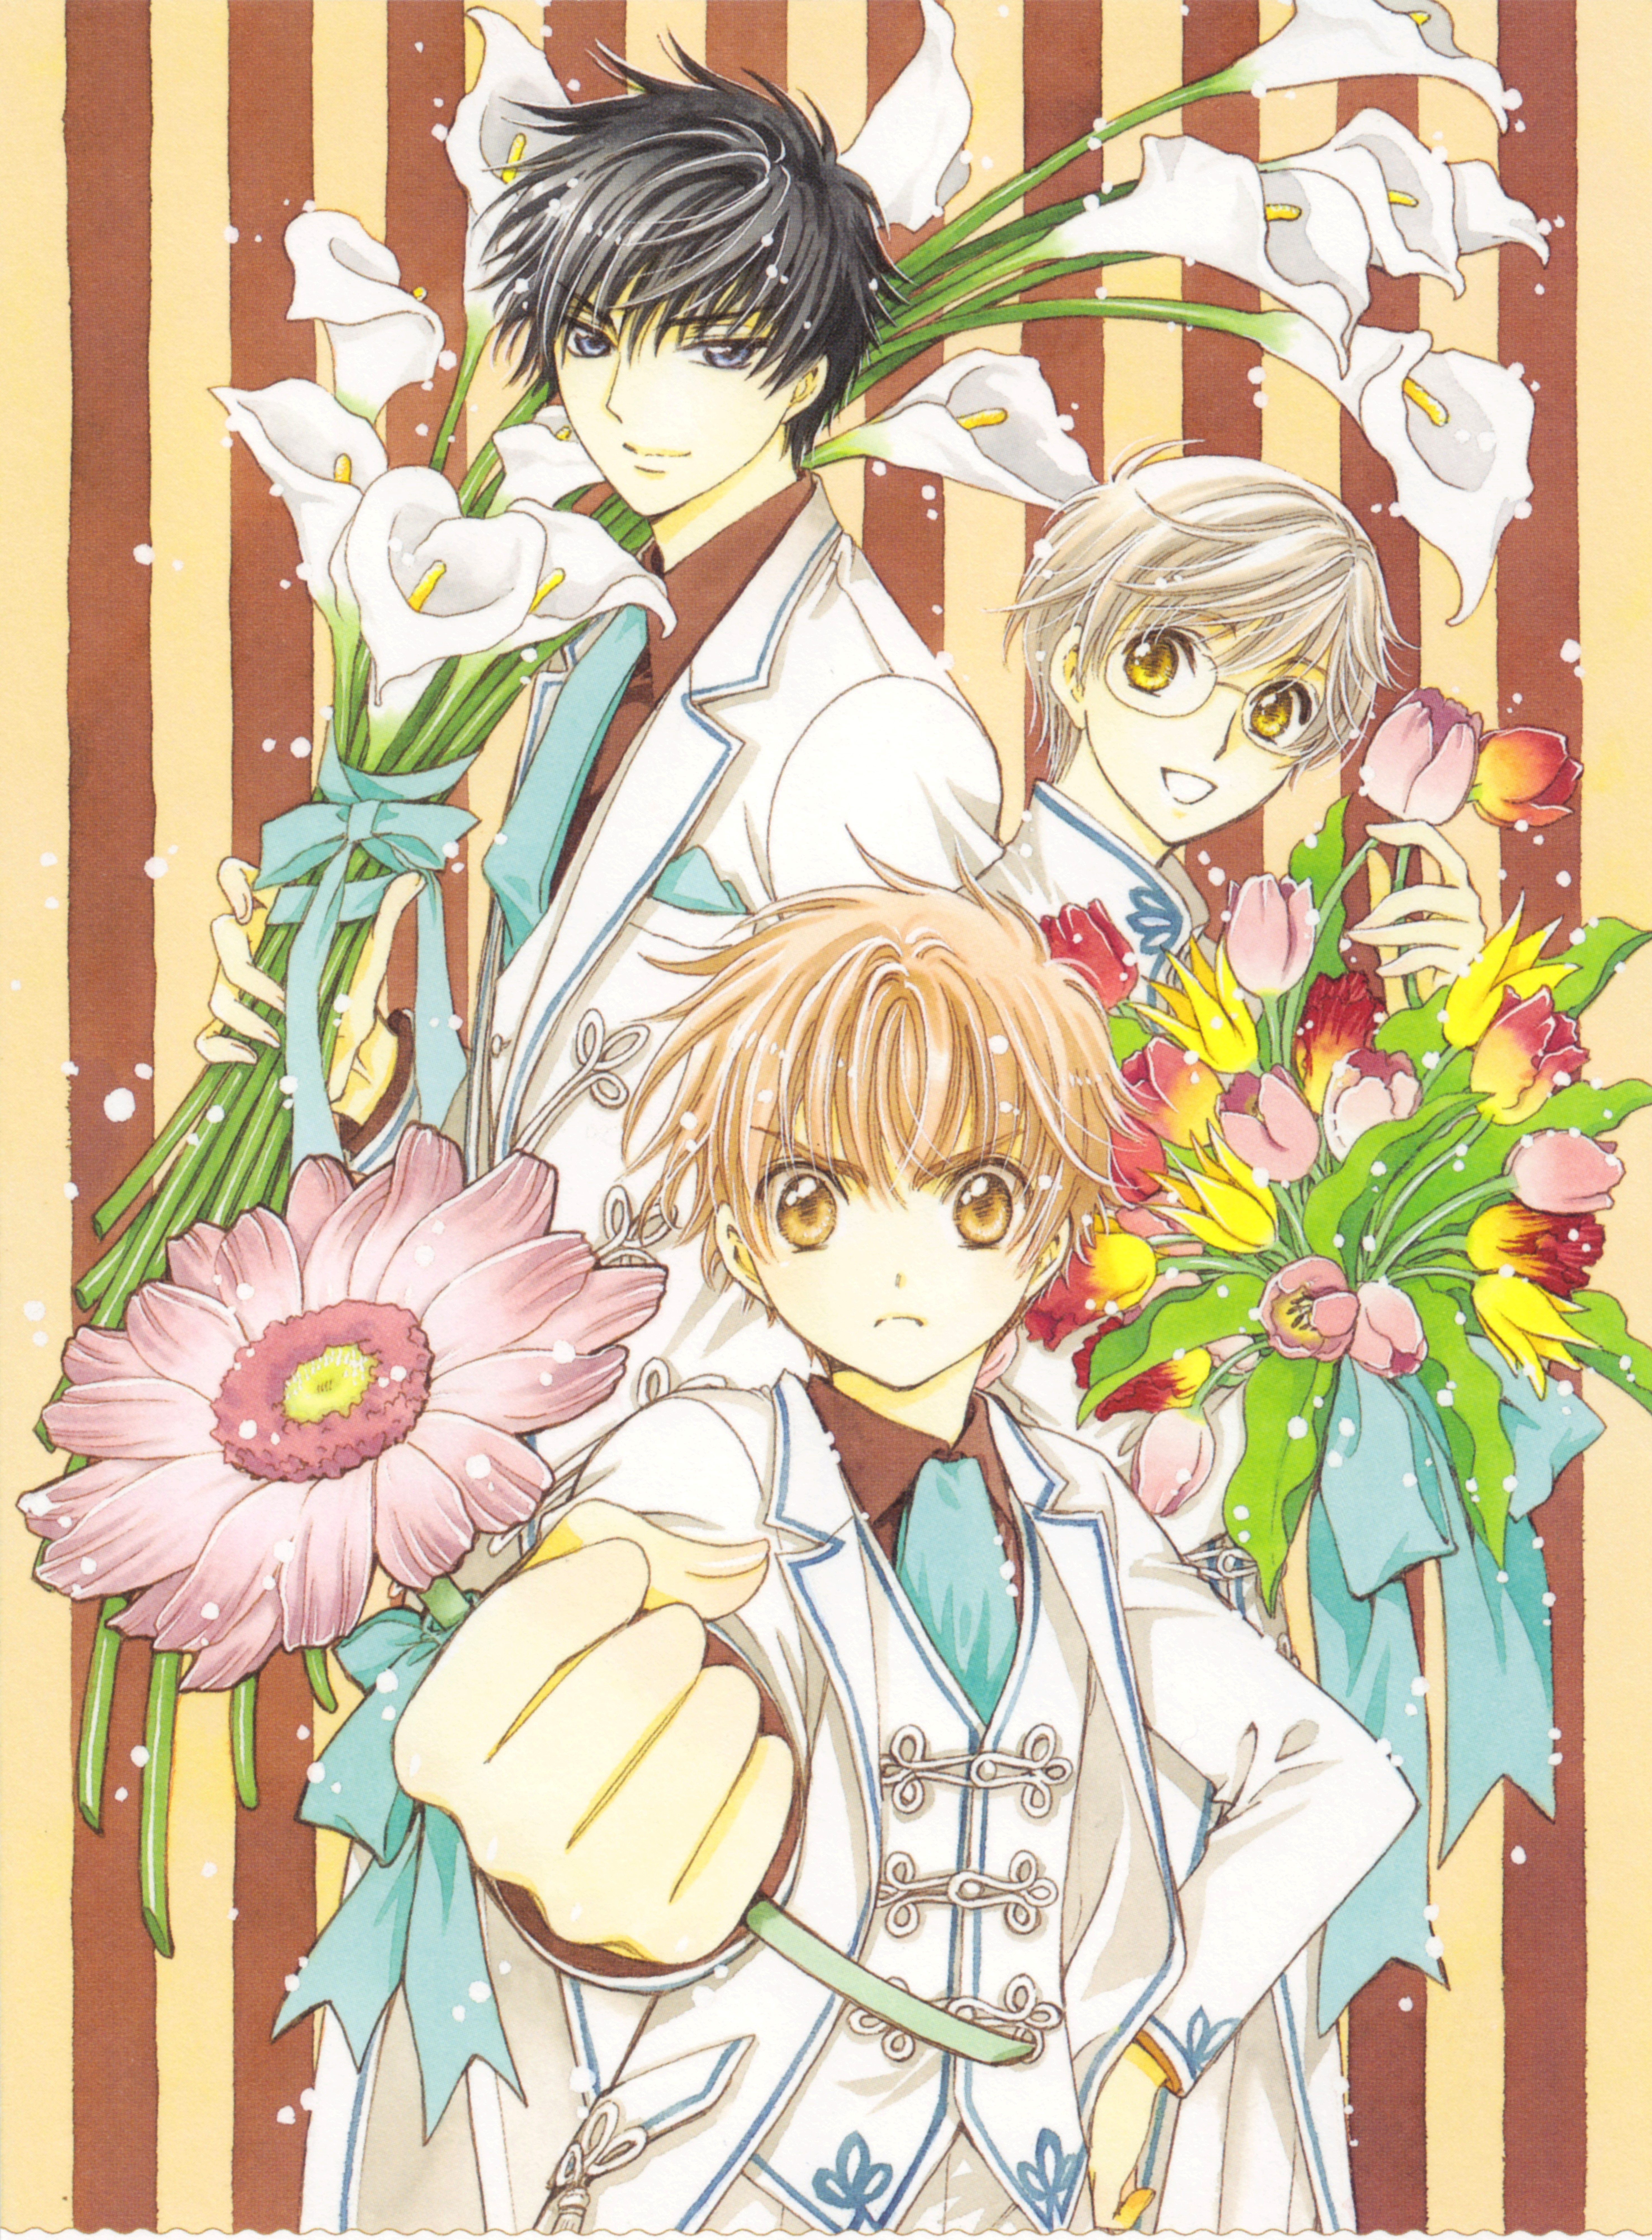 Card captor sakura manga download raw.